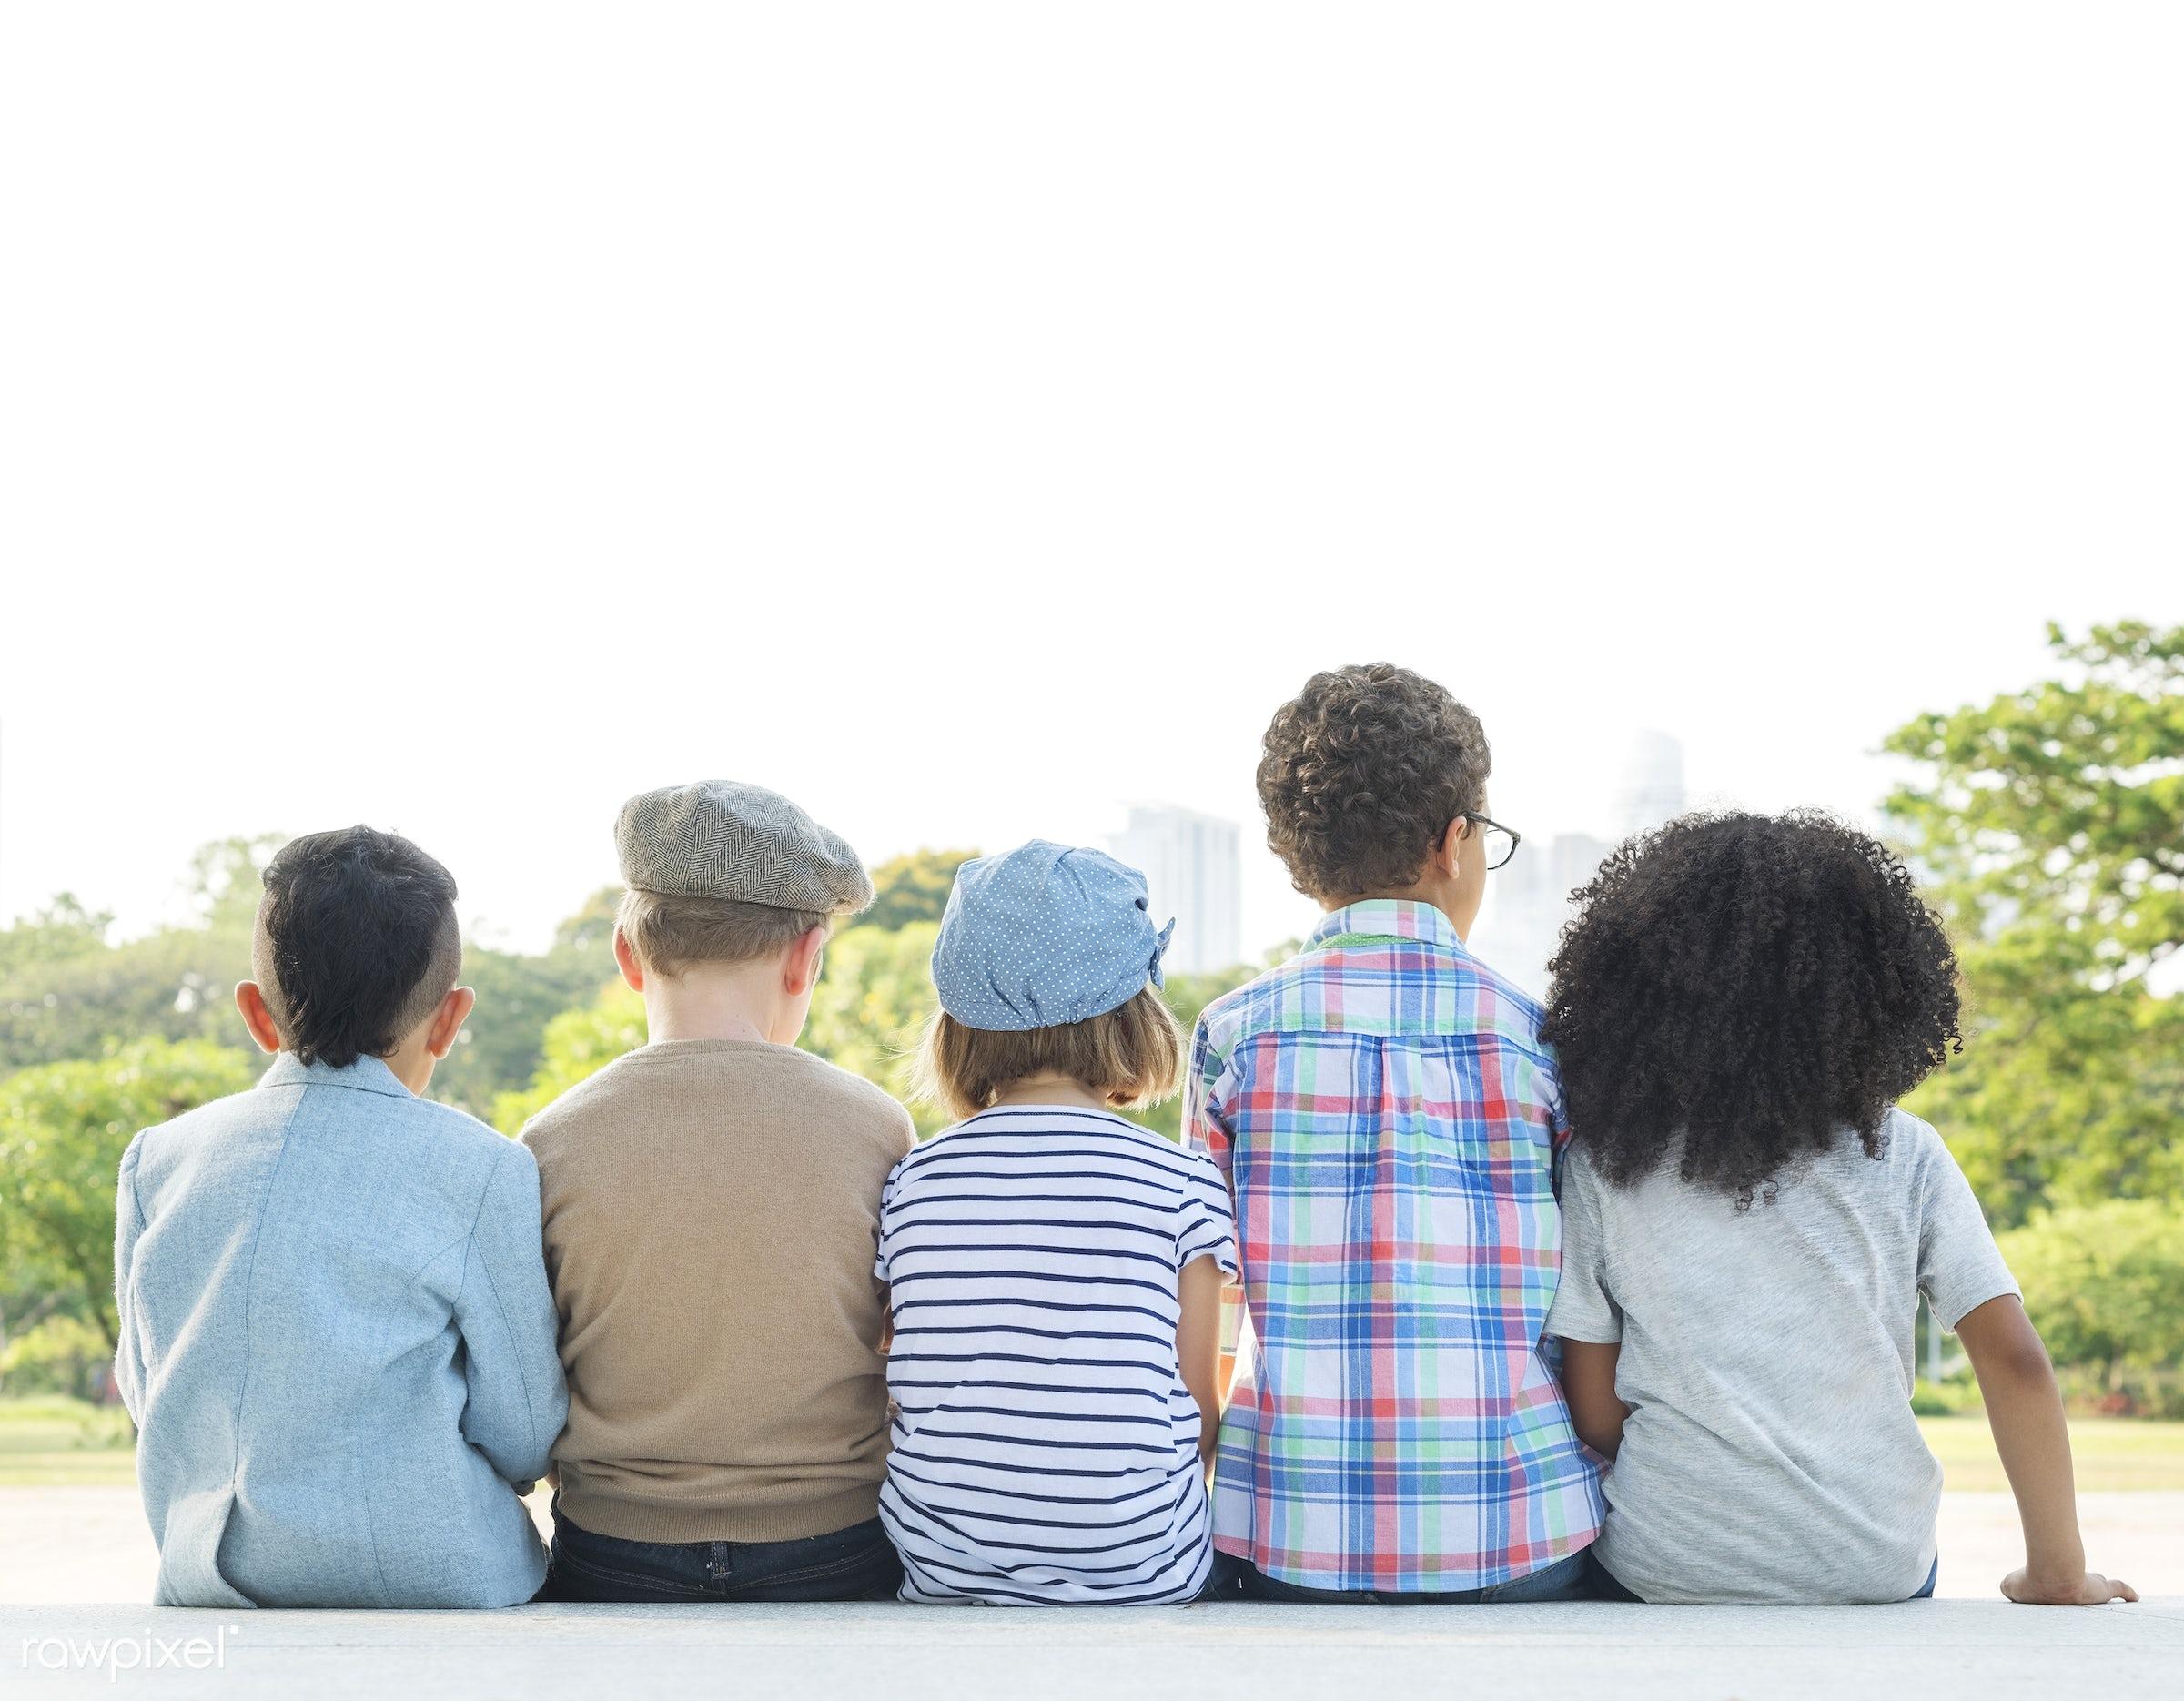 bonding, boys, childhood, children, contemplation, elementary age, fashion, friends, friendship, girls, group of kids,...